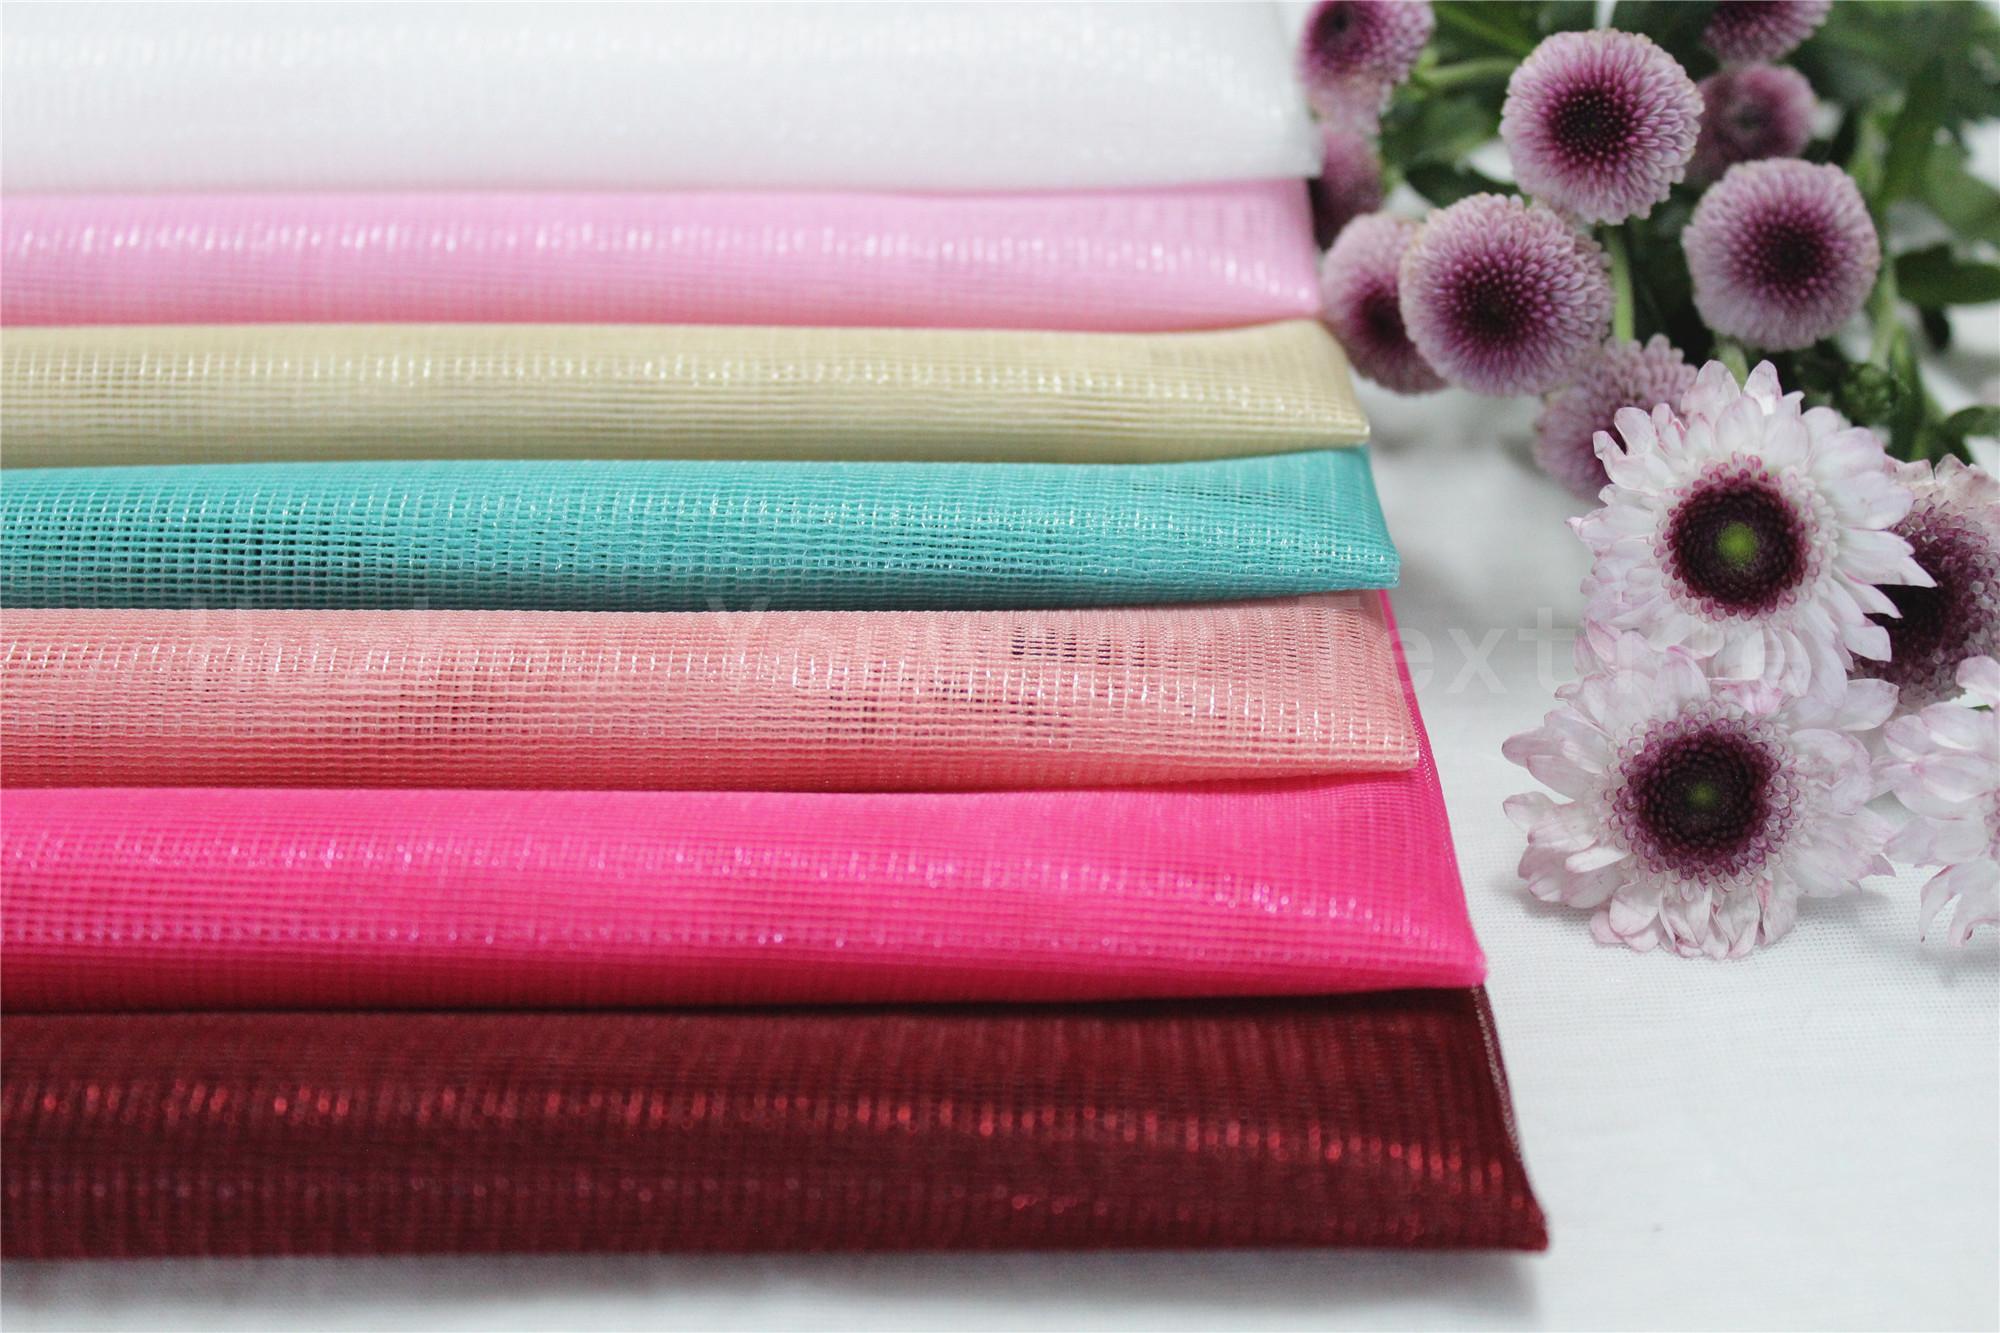 Shiny Tull Fabric For Curtain Using